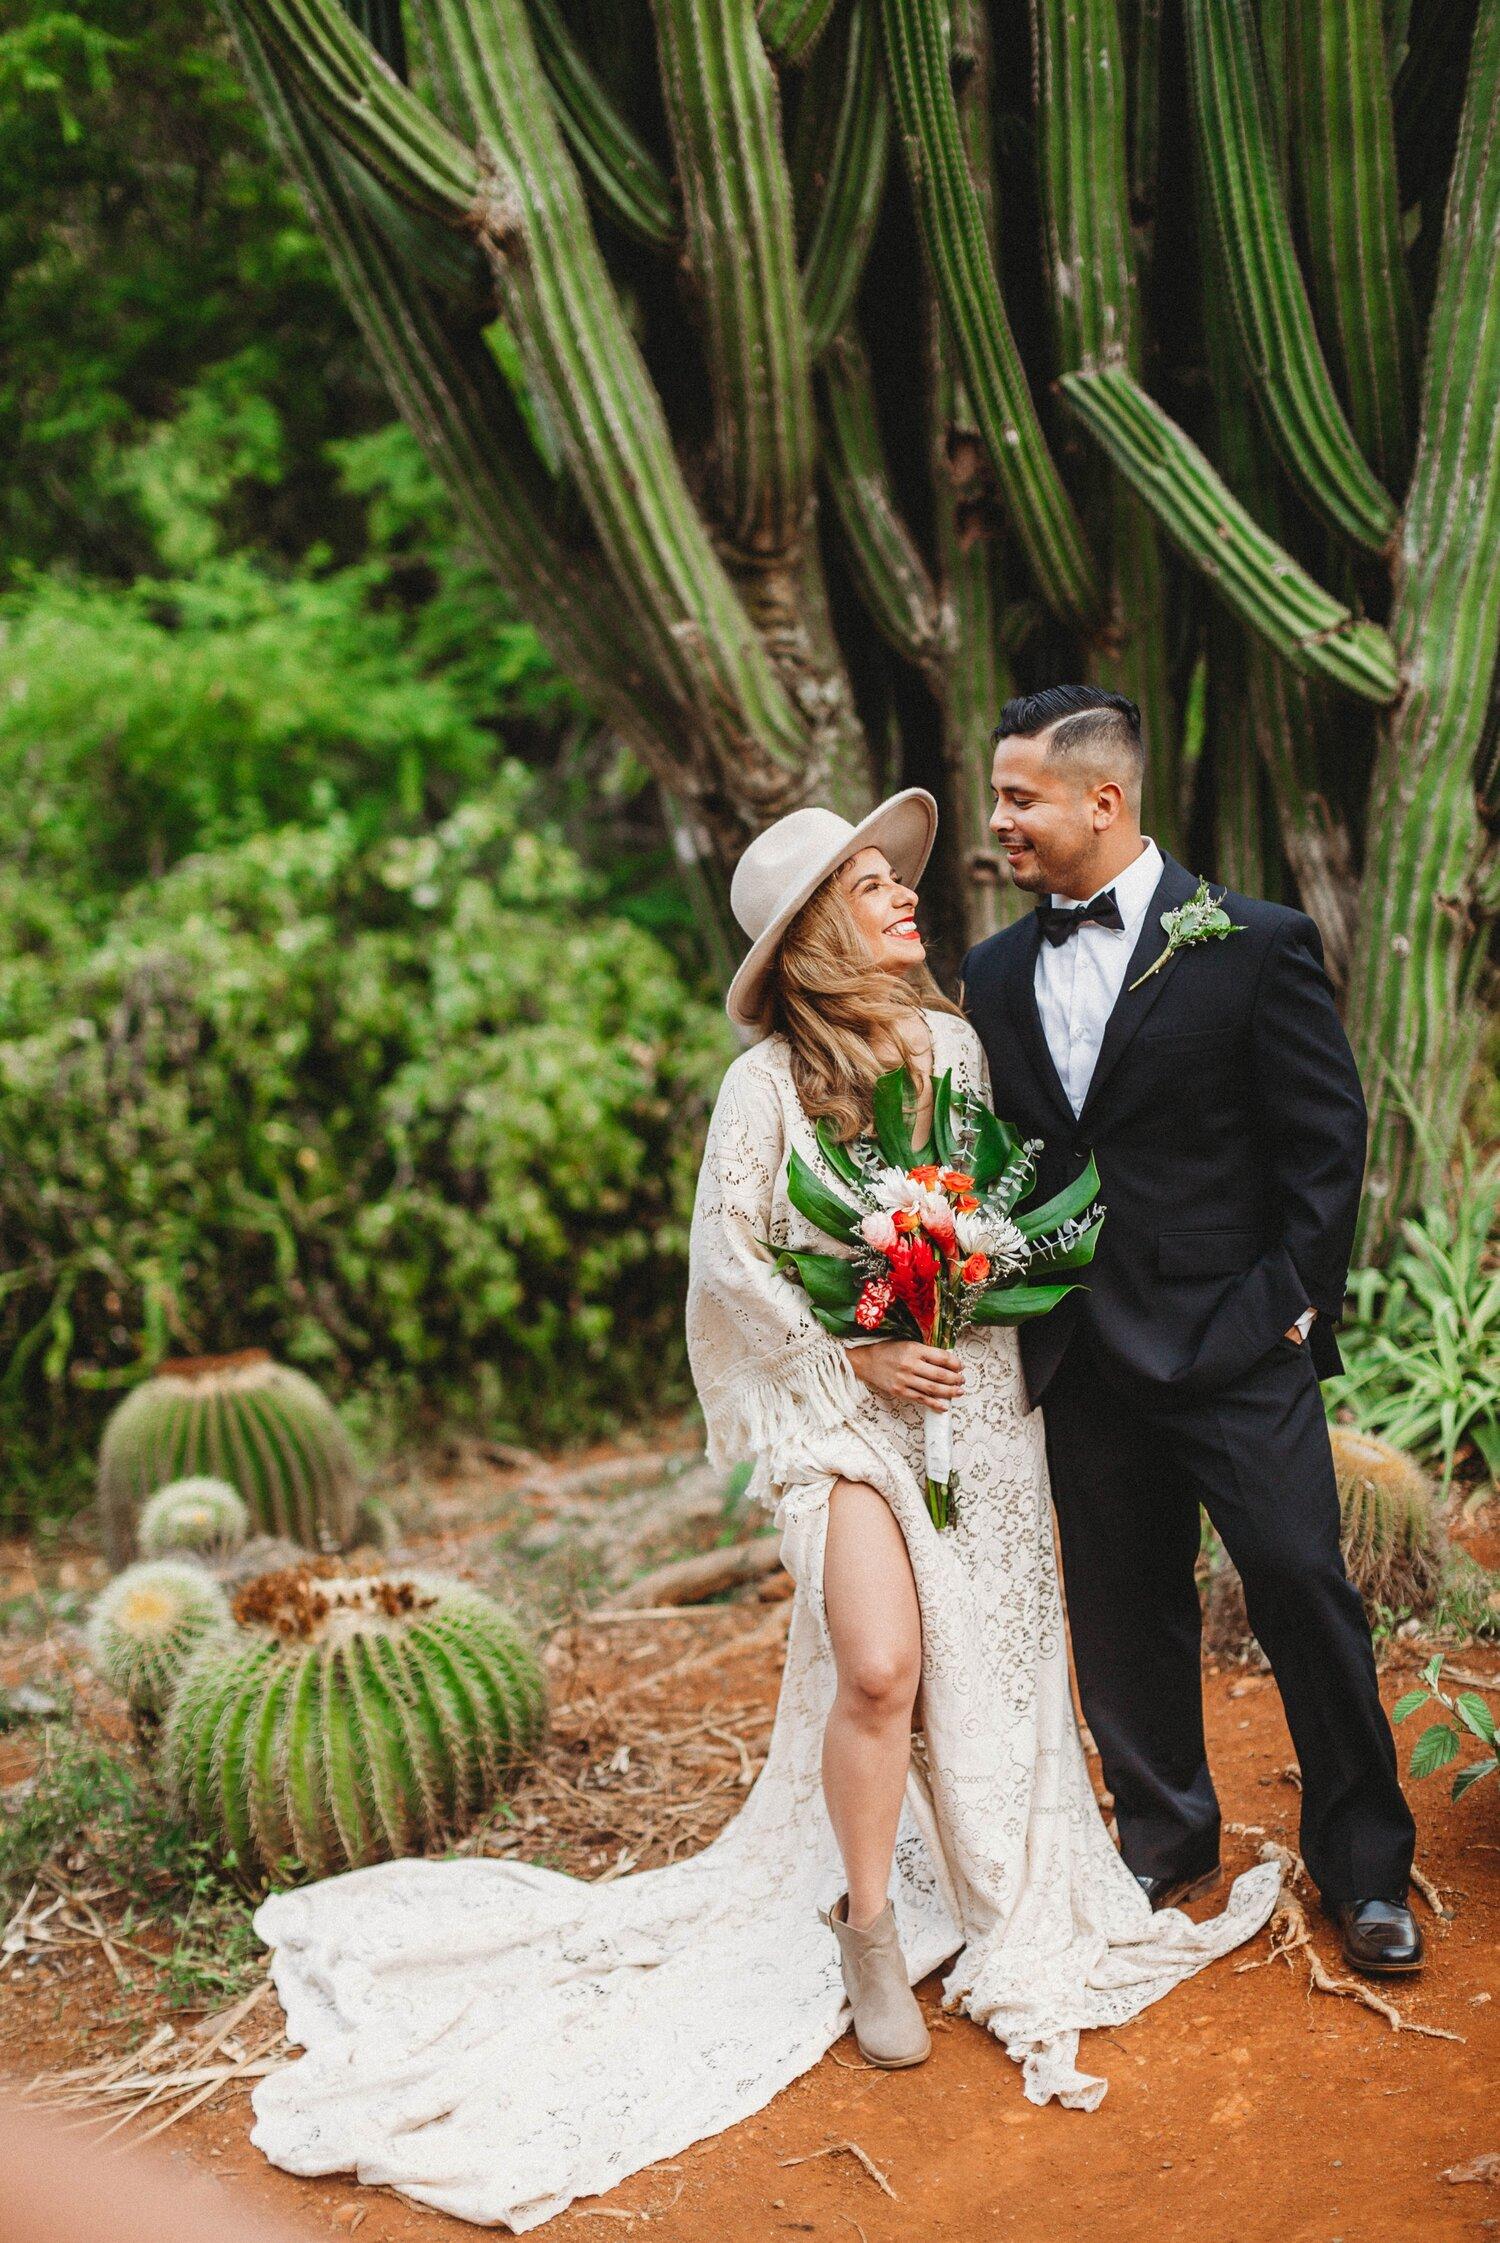 Boho Cactus Elopement - Honolulu, Koko Crater Botanical Garden - Oahu Hawaii Wedding Photographer 31.jpg